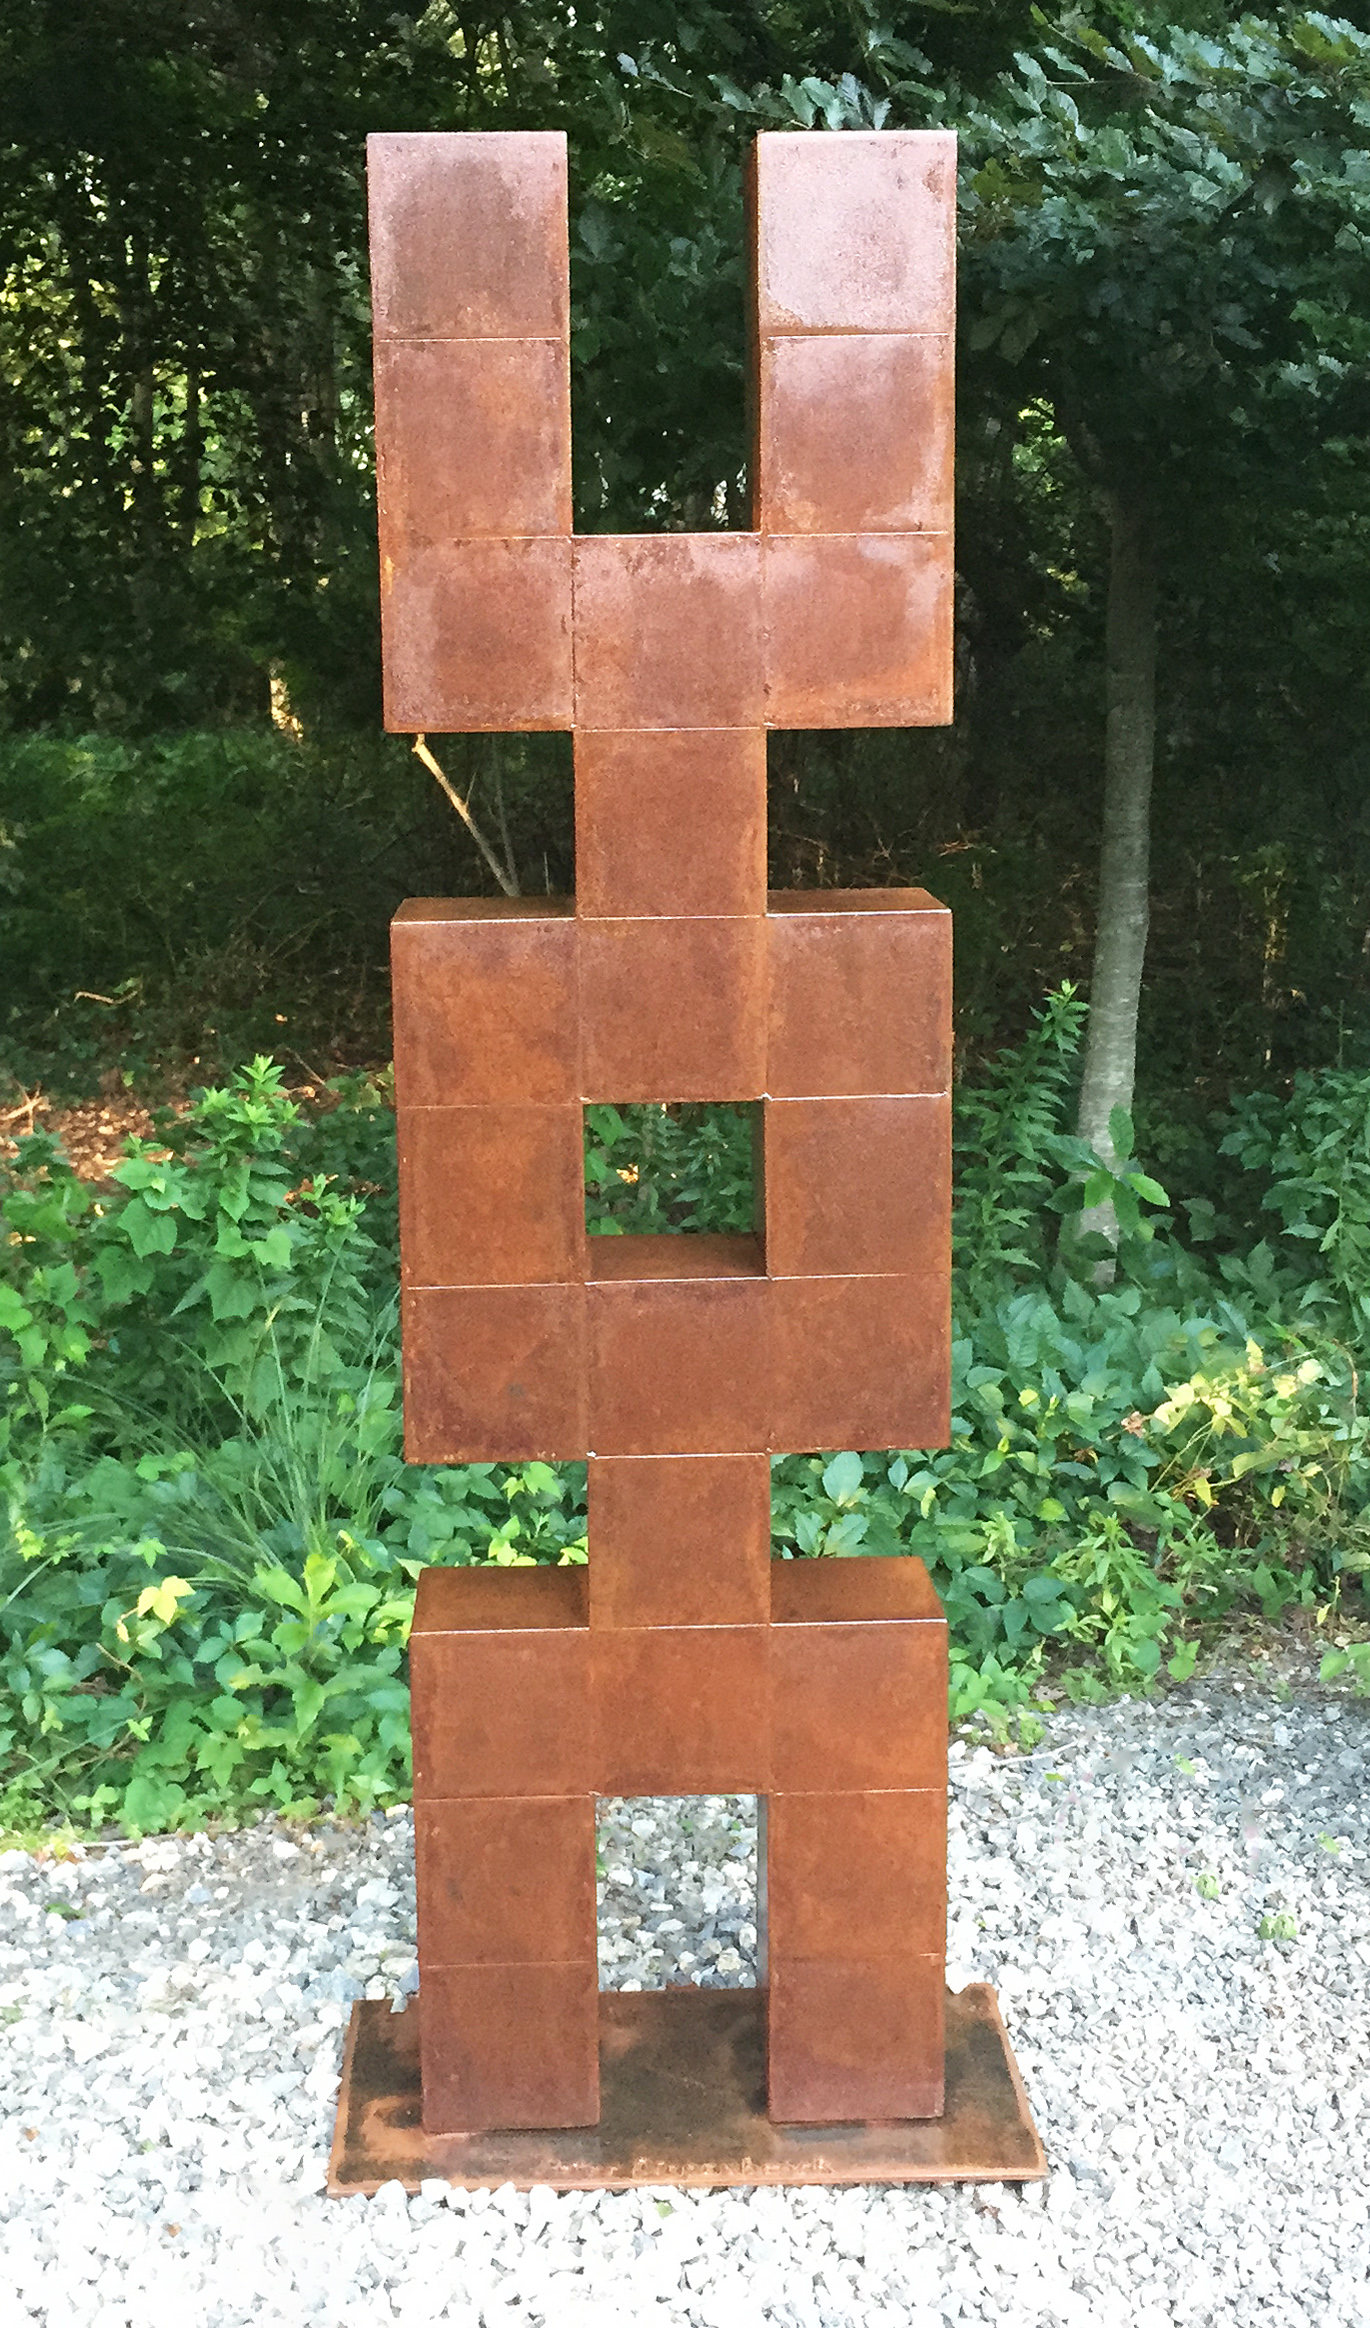 Cubic Totem I